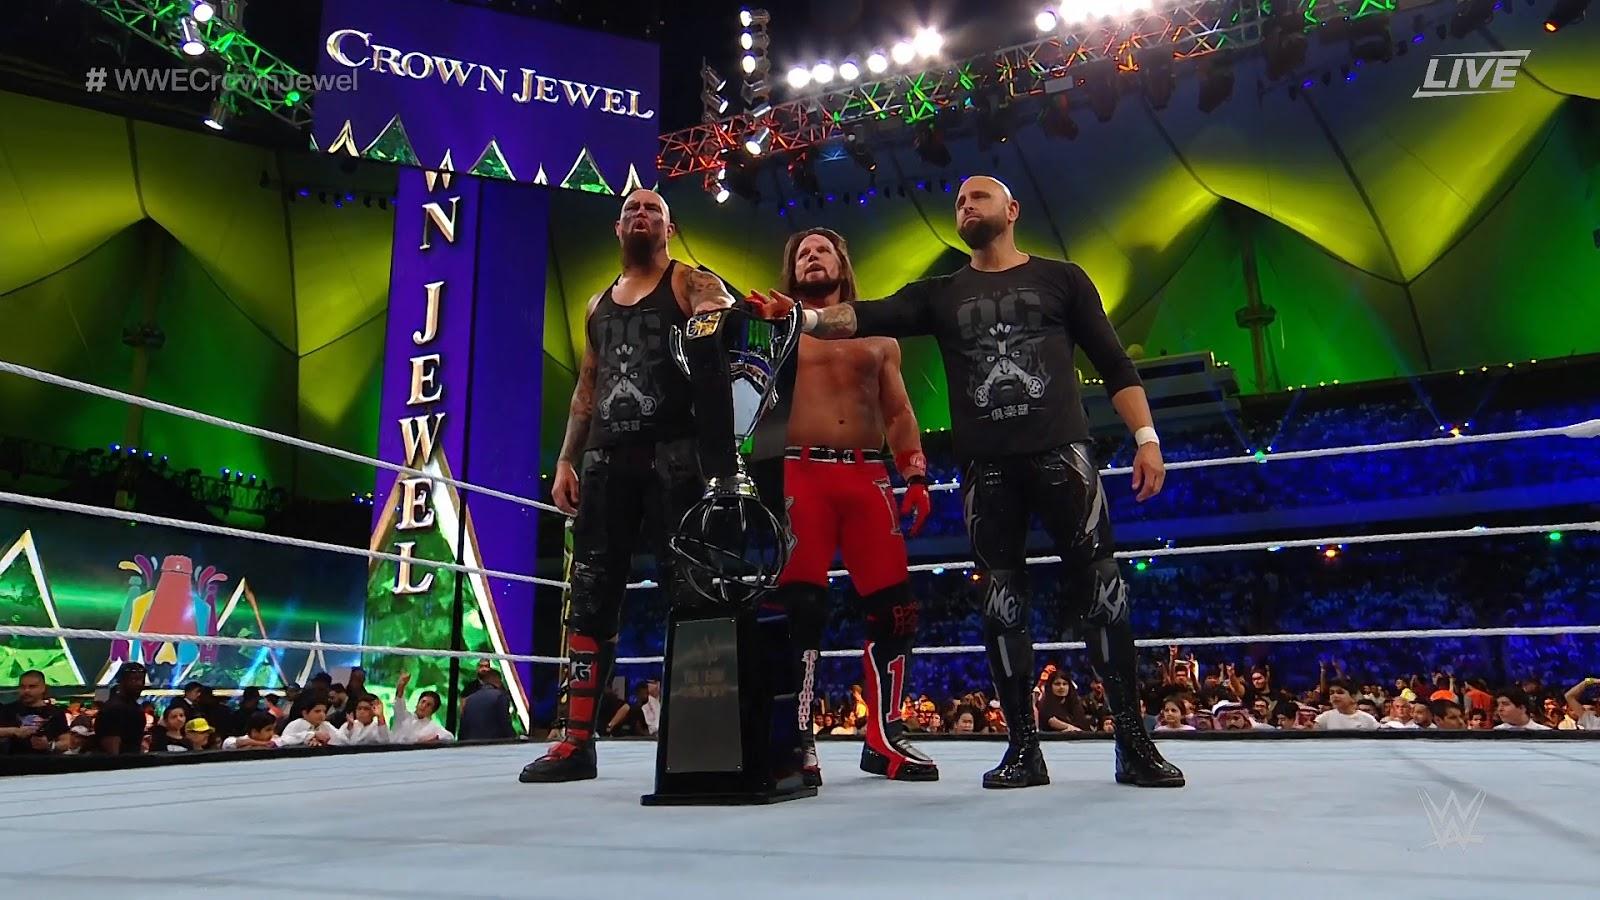 WWE+CJ+%282019%29+Full+HD+1080p+Latino+5.1+-+Descargatepelis.com.mkv_snapshot_02.04.22.455.jpg (1600×900)